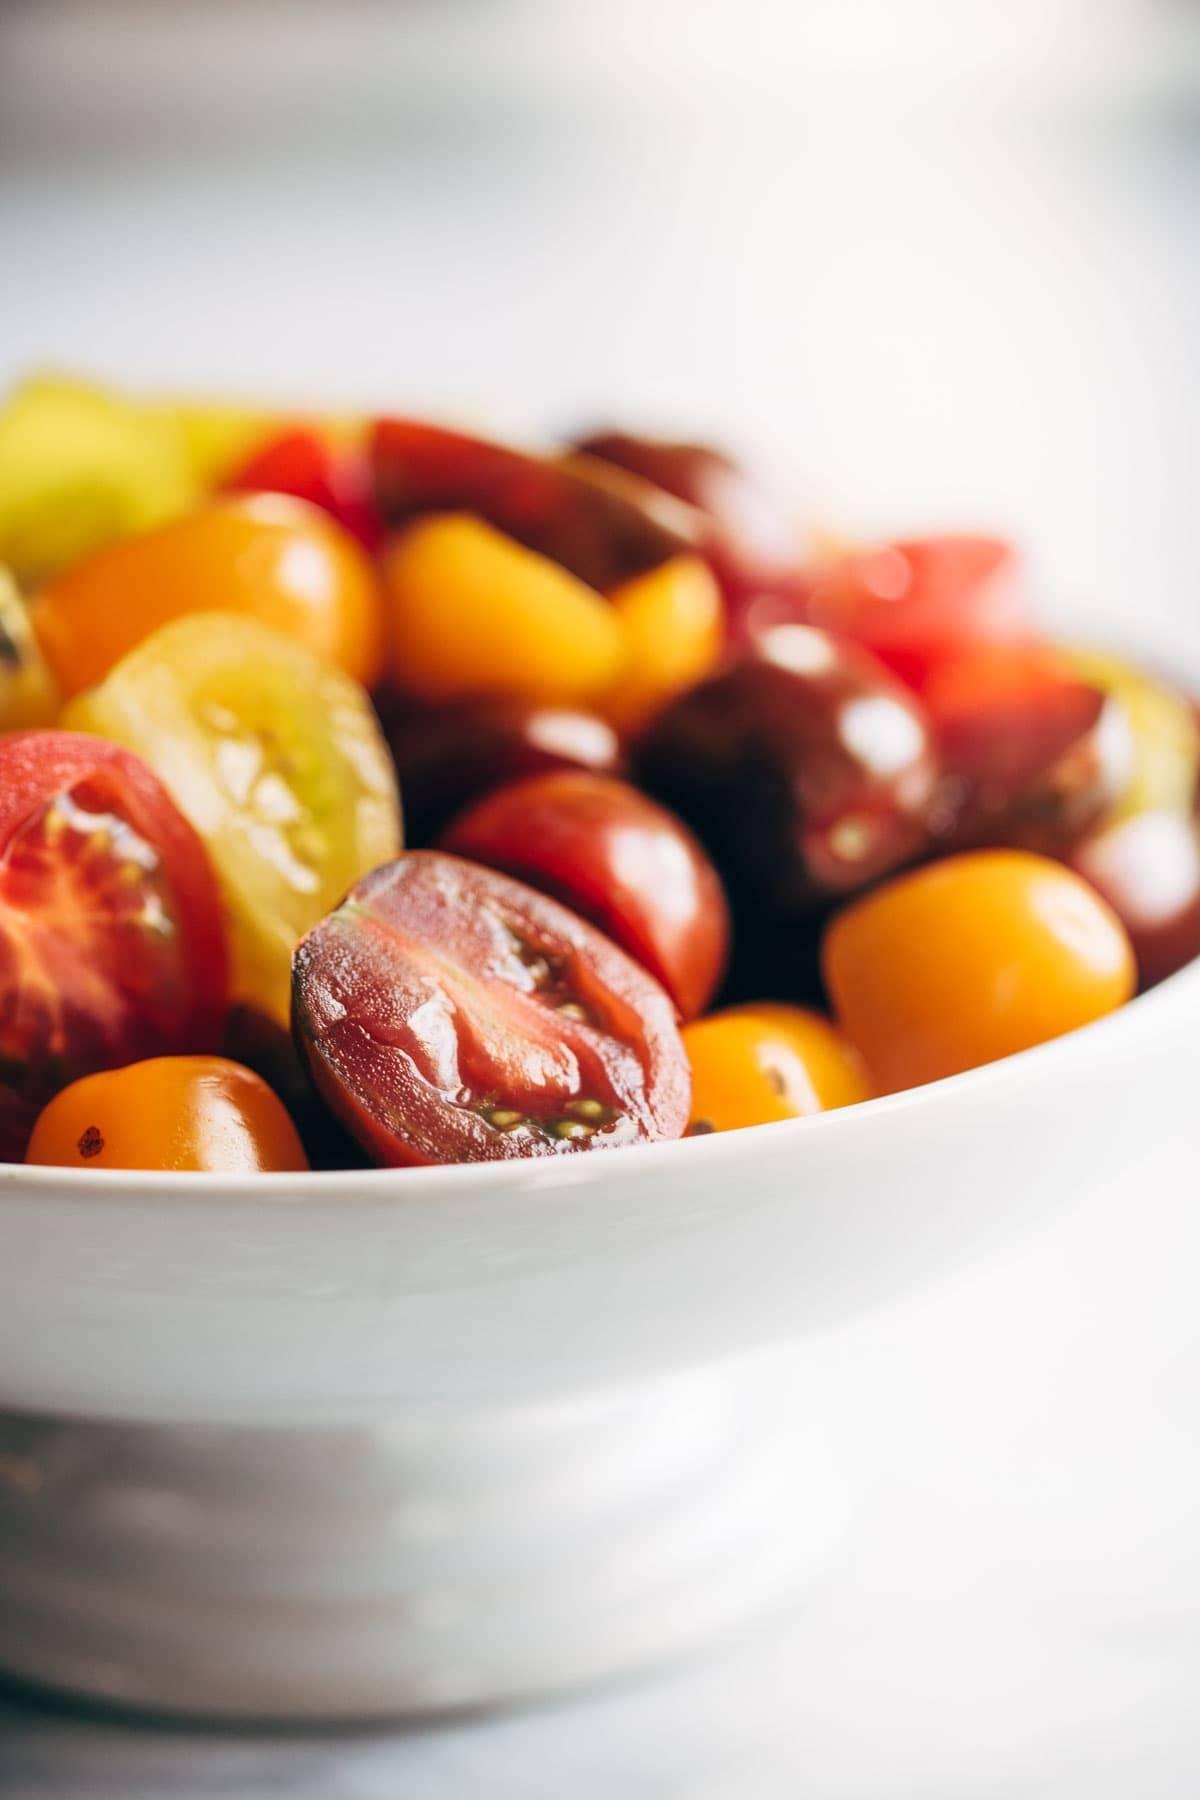 Tomatoes for Capellini Pomodoro | pinchofyum.com